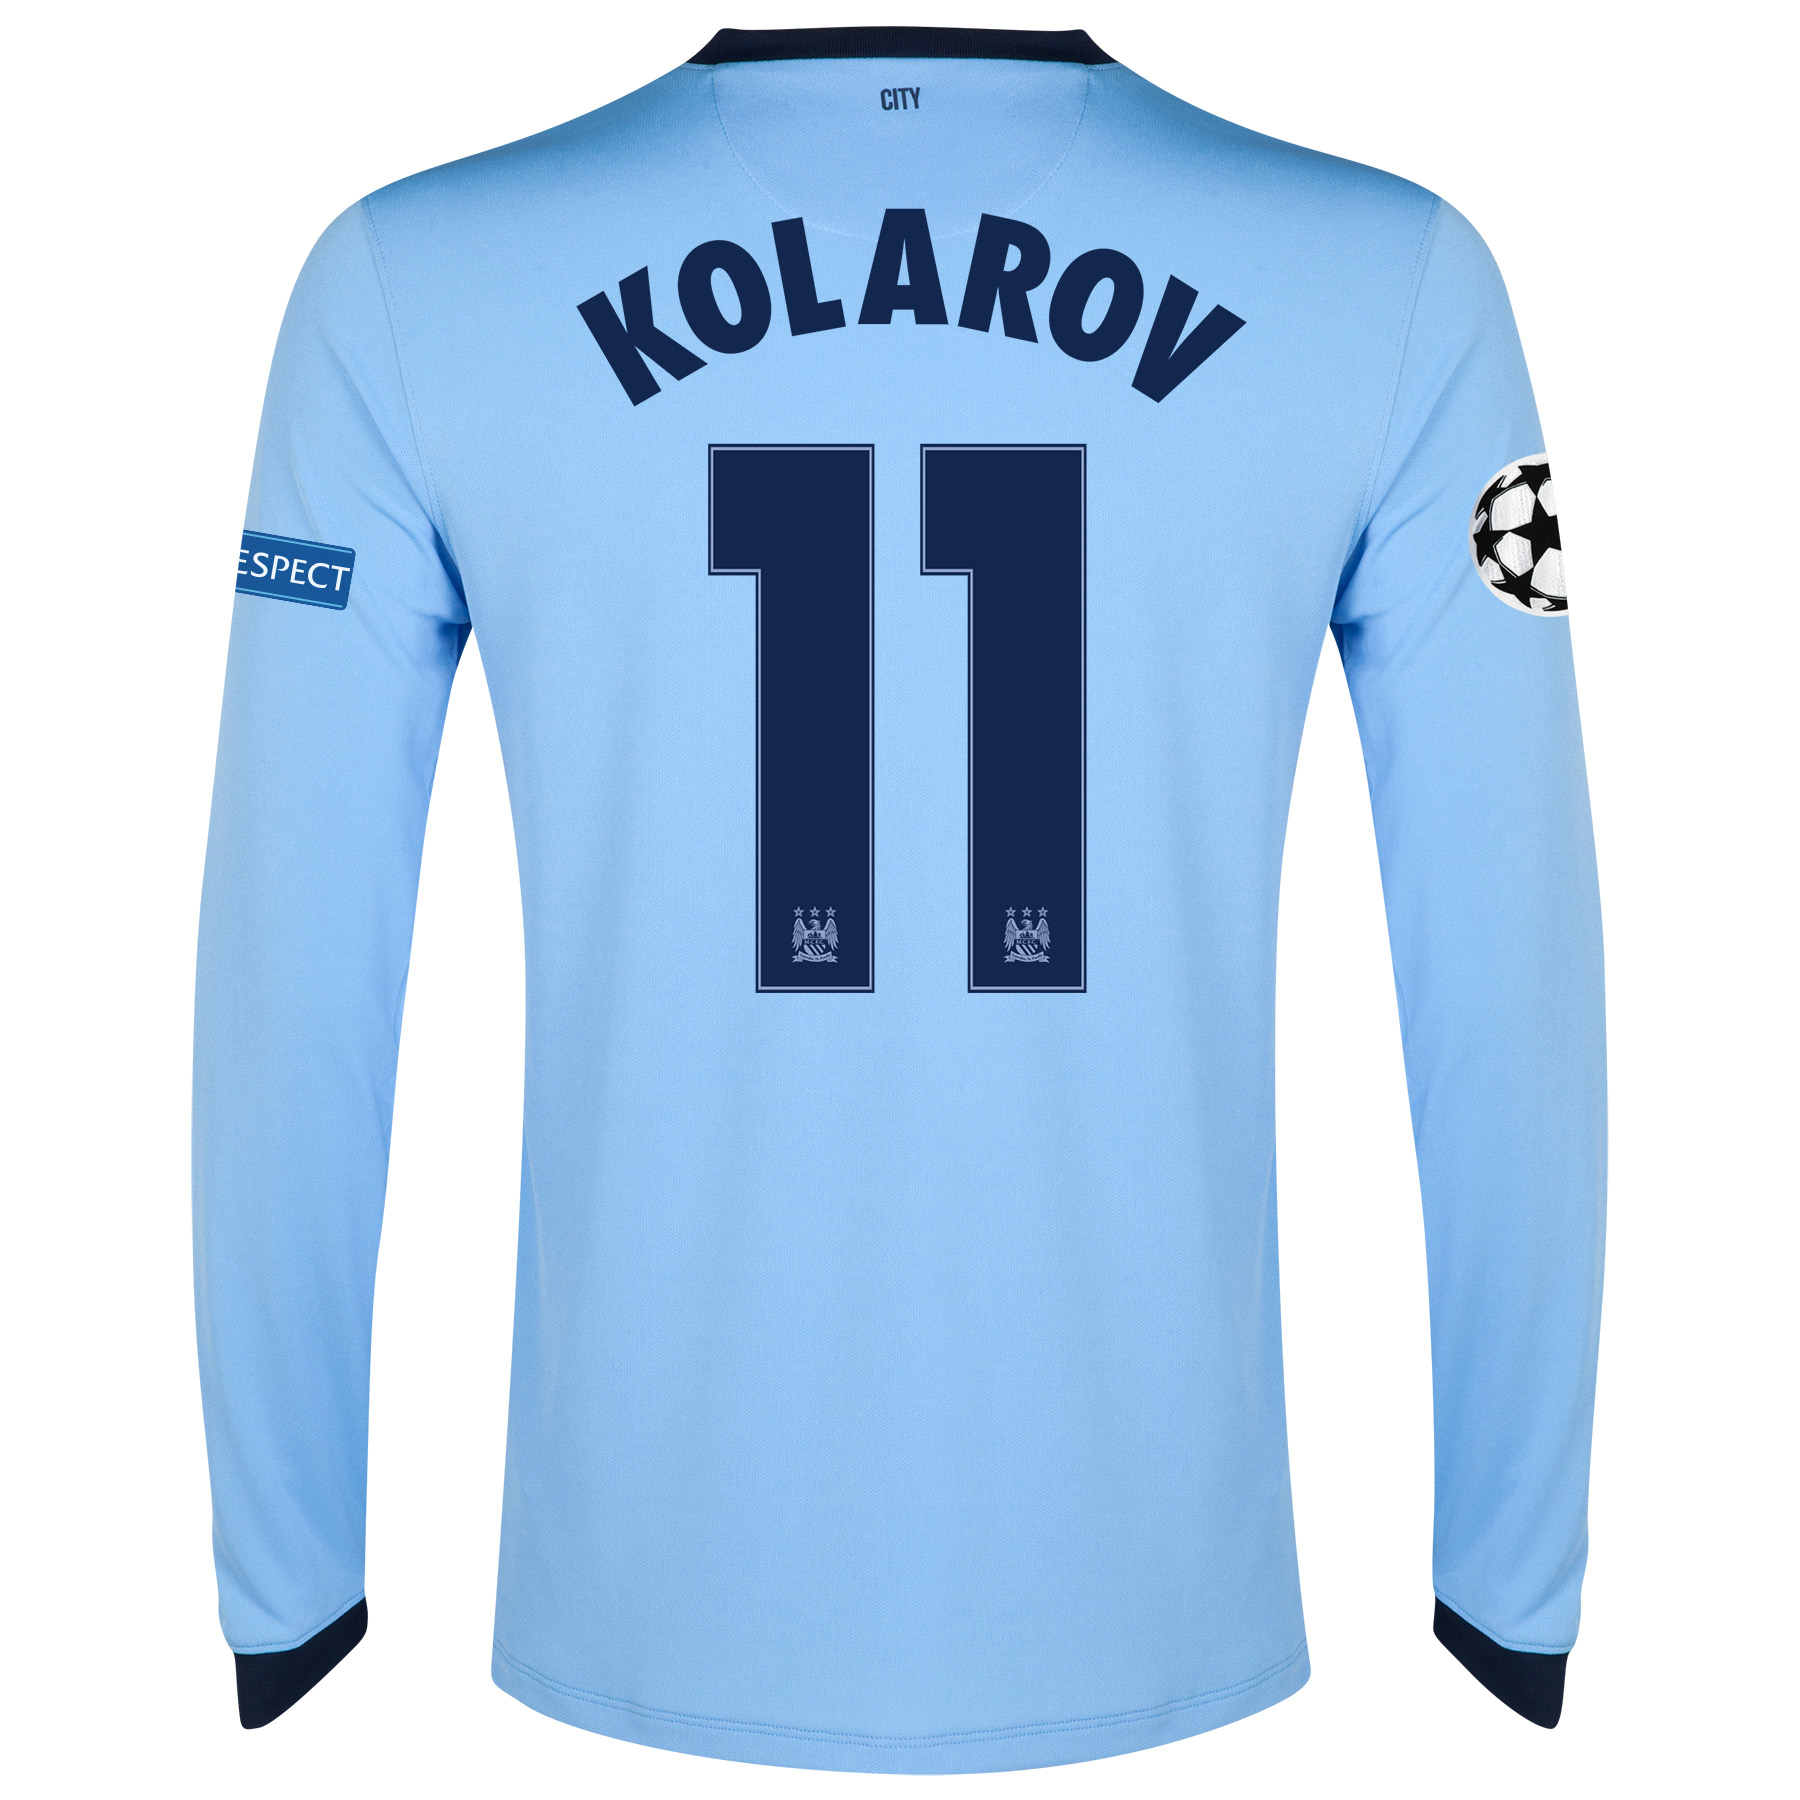 Manchester City UEFA Champions League Home Shirt 2014/15 - Long Sleeve - Kids Sky Blue with Kolarov 11 printing